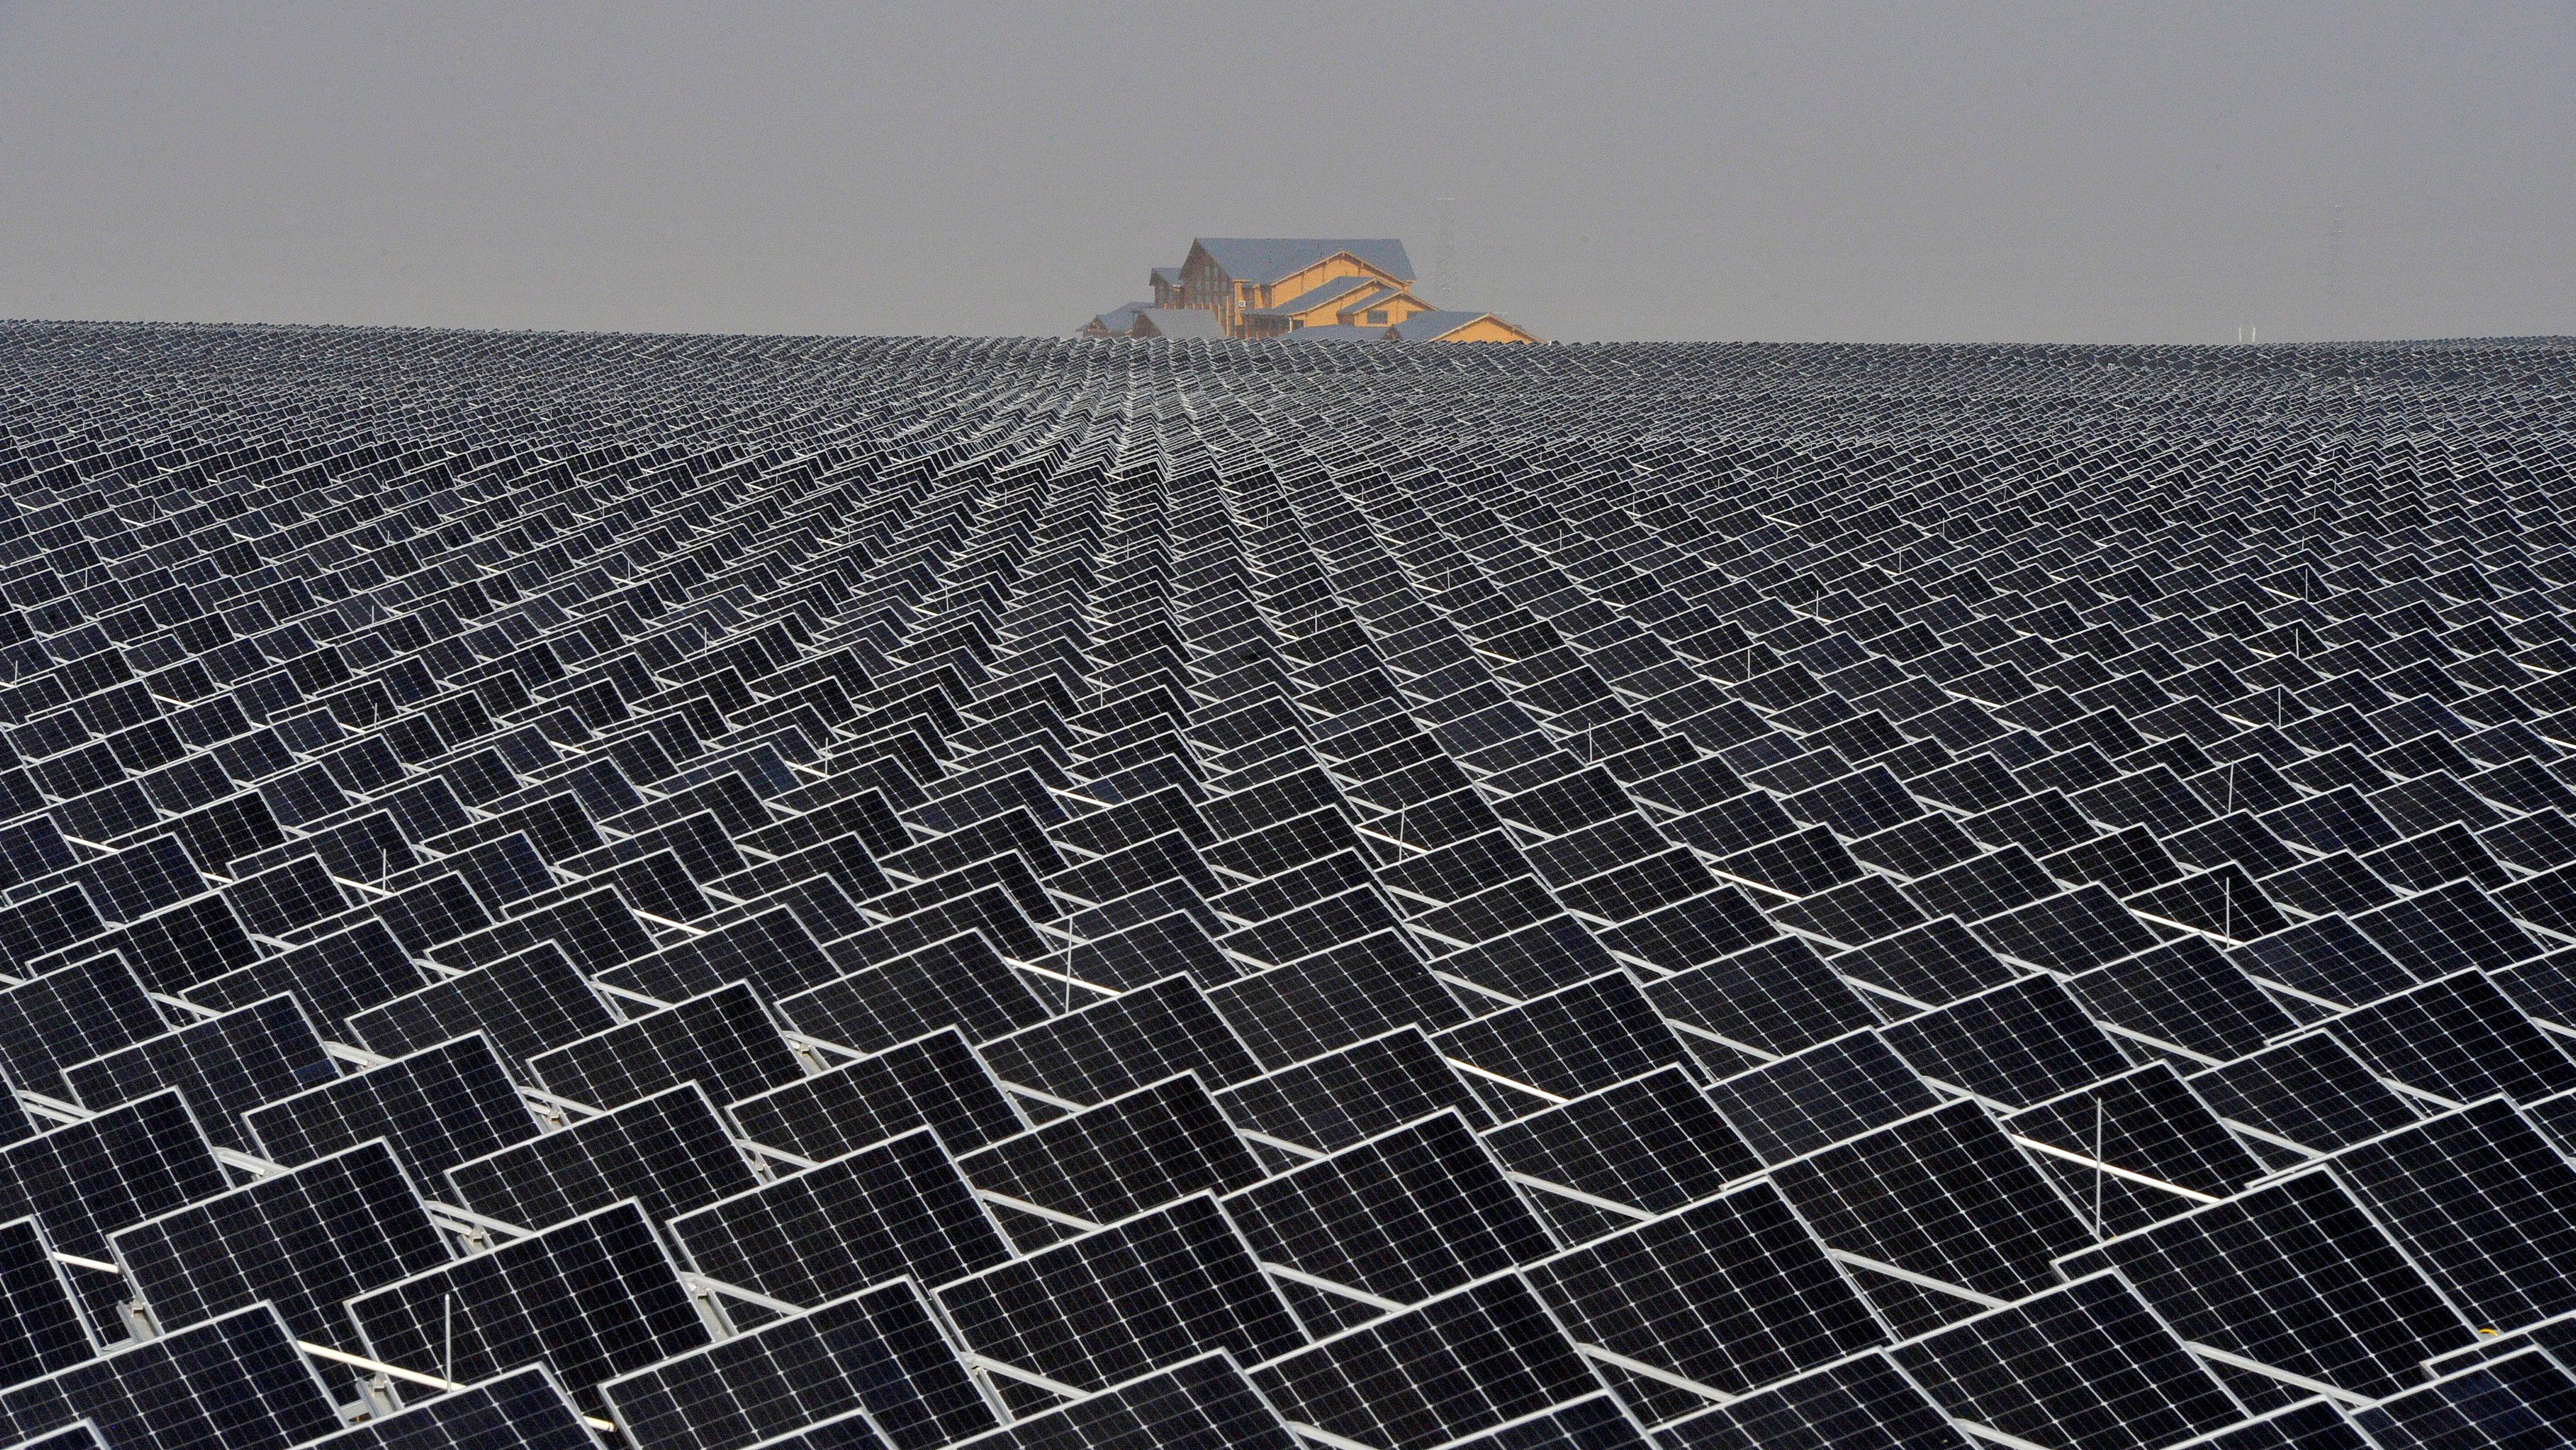 Solar panels are seen in Yinchuan, Ningxia Hui Autonomous Region, China April 18, 2017.